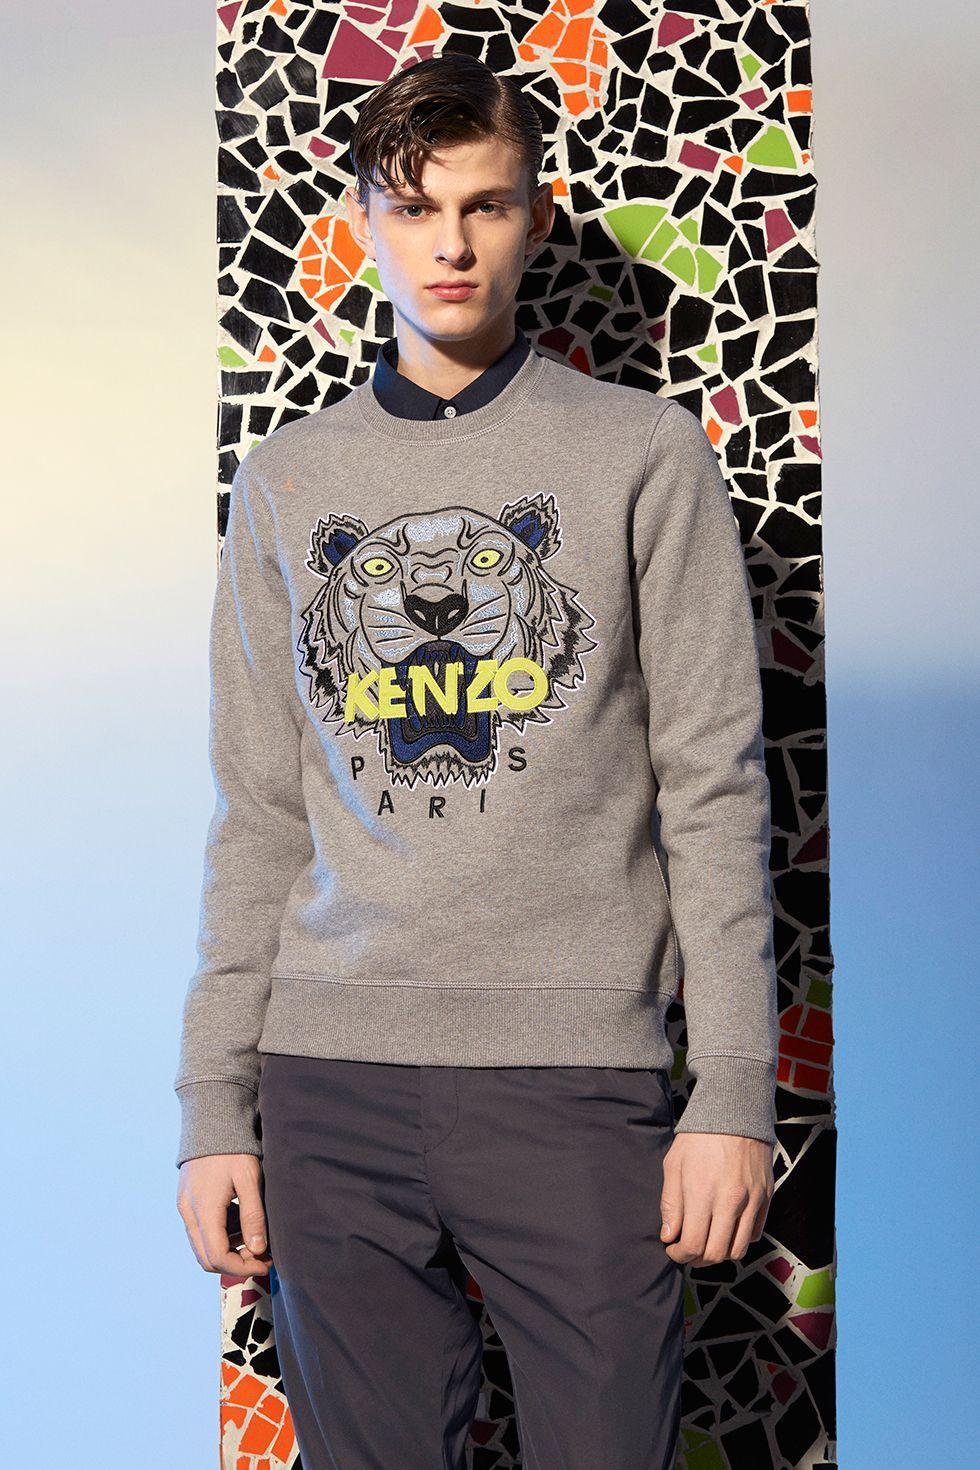 Kenzo Tiger Sweatshirt , Kenzo Sweatshirts \u0026 Sweaters Men , Kenzo E,shop